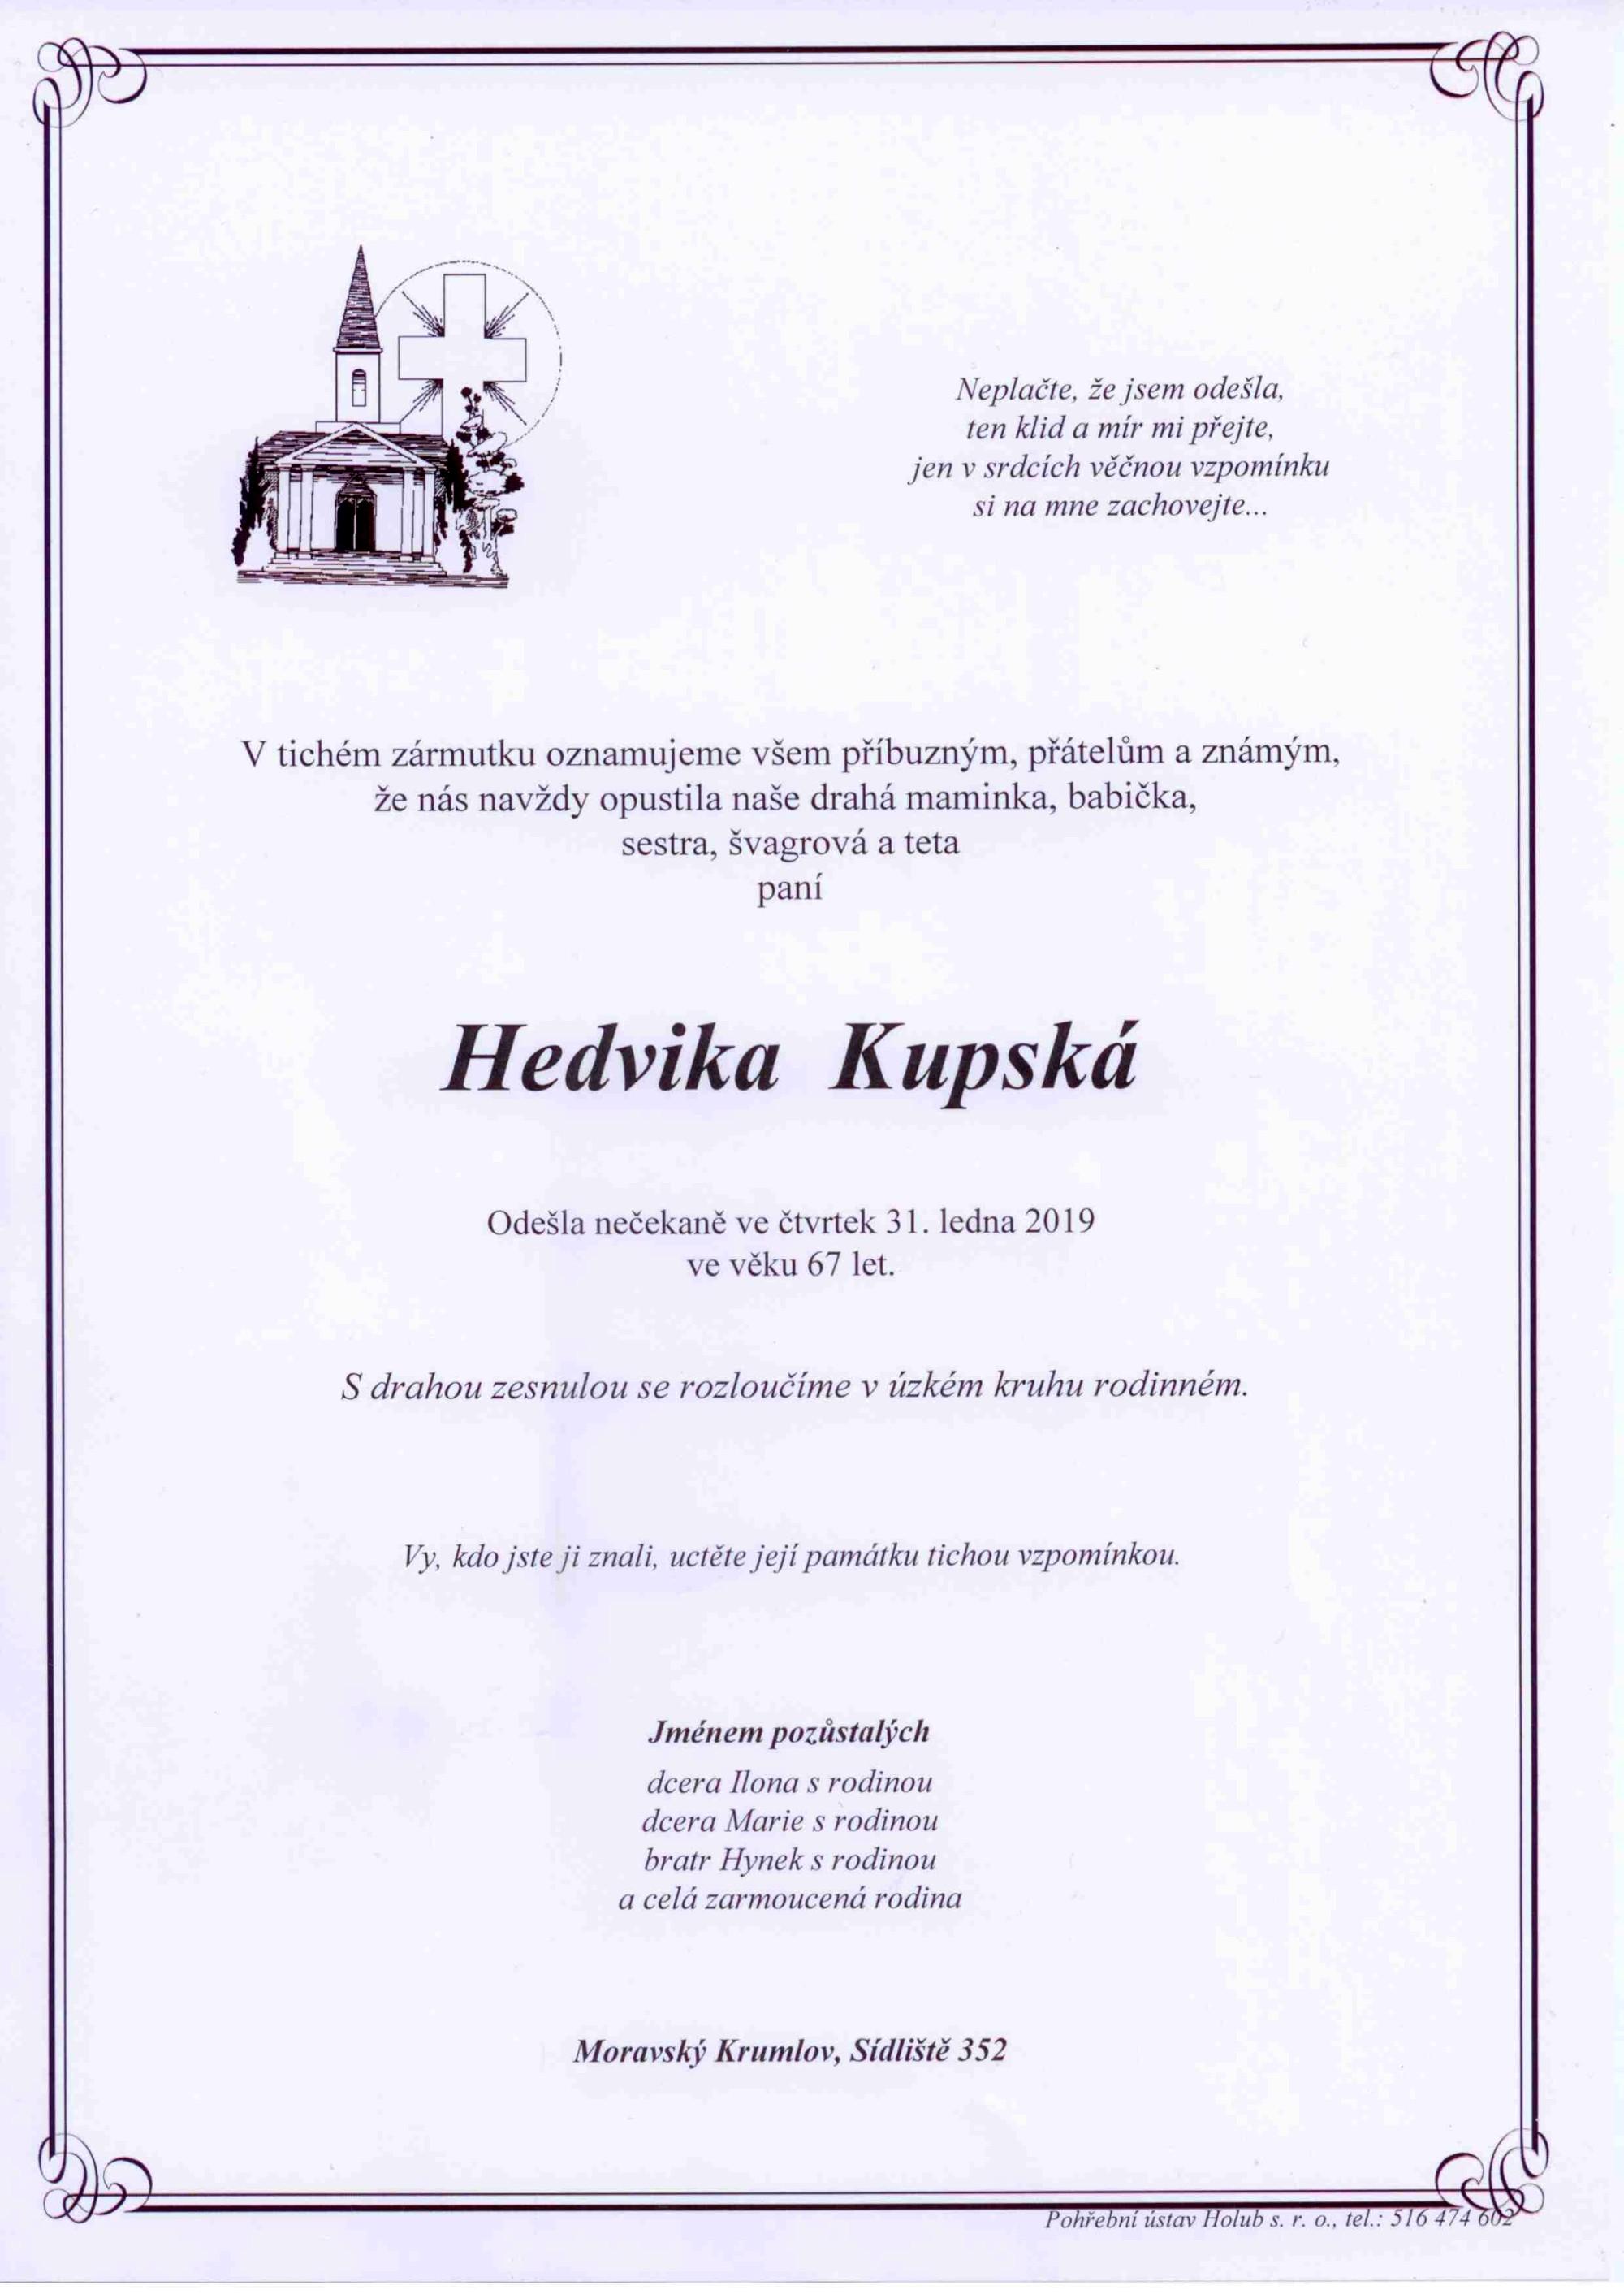 Hedvika